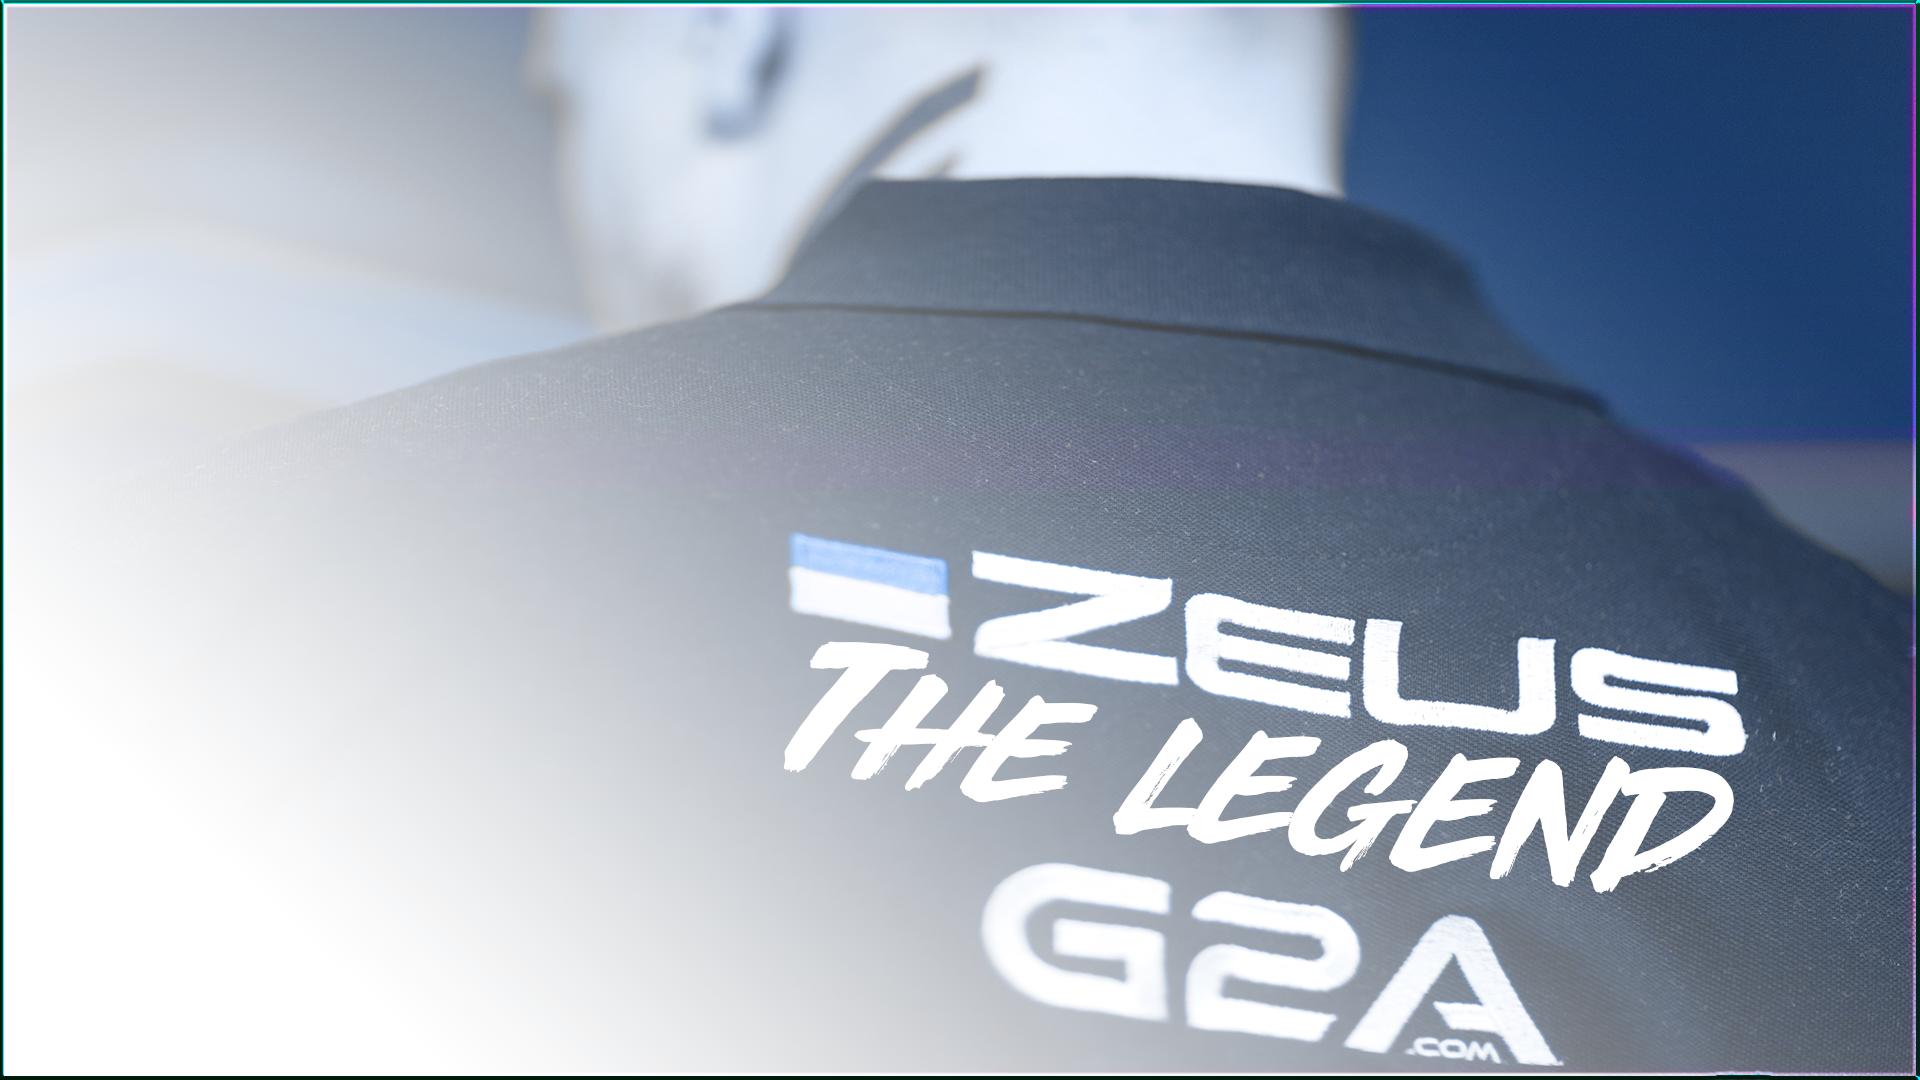 Zeus the legend2 By Ronofar